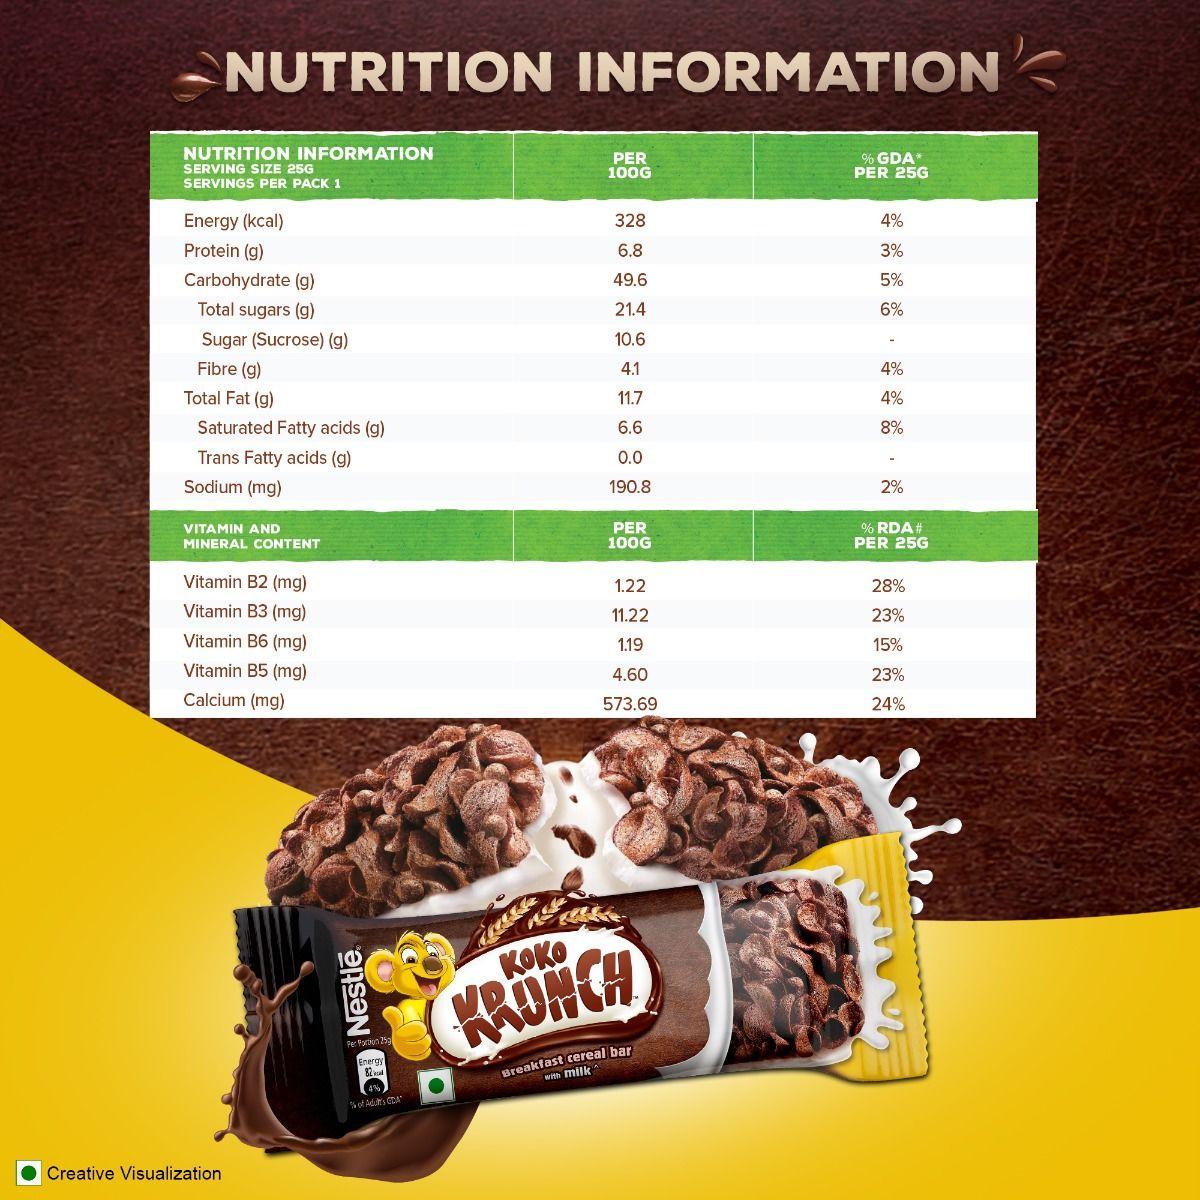 Nestle Koko Crunch Breakfast Cereal Bar, 25 gm, Pack of 1